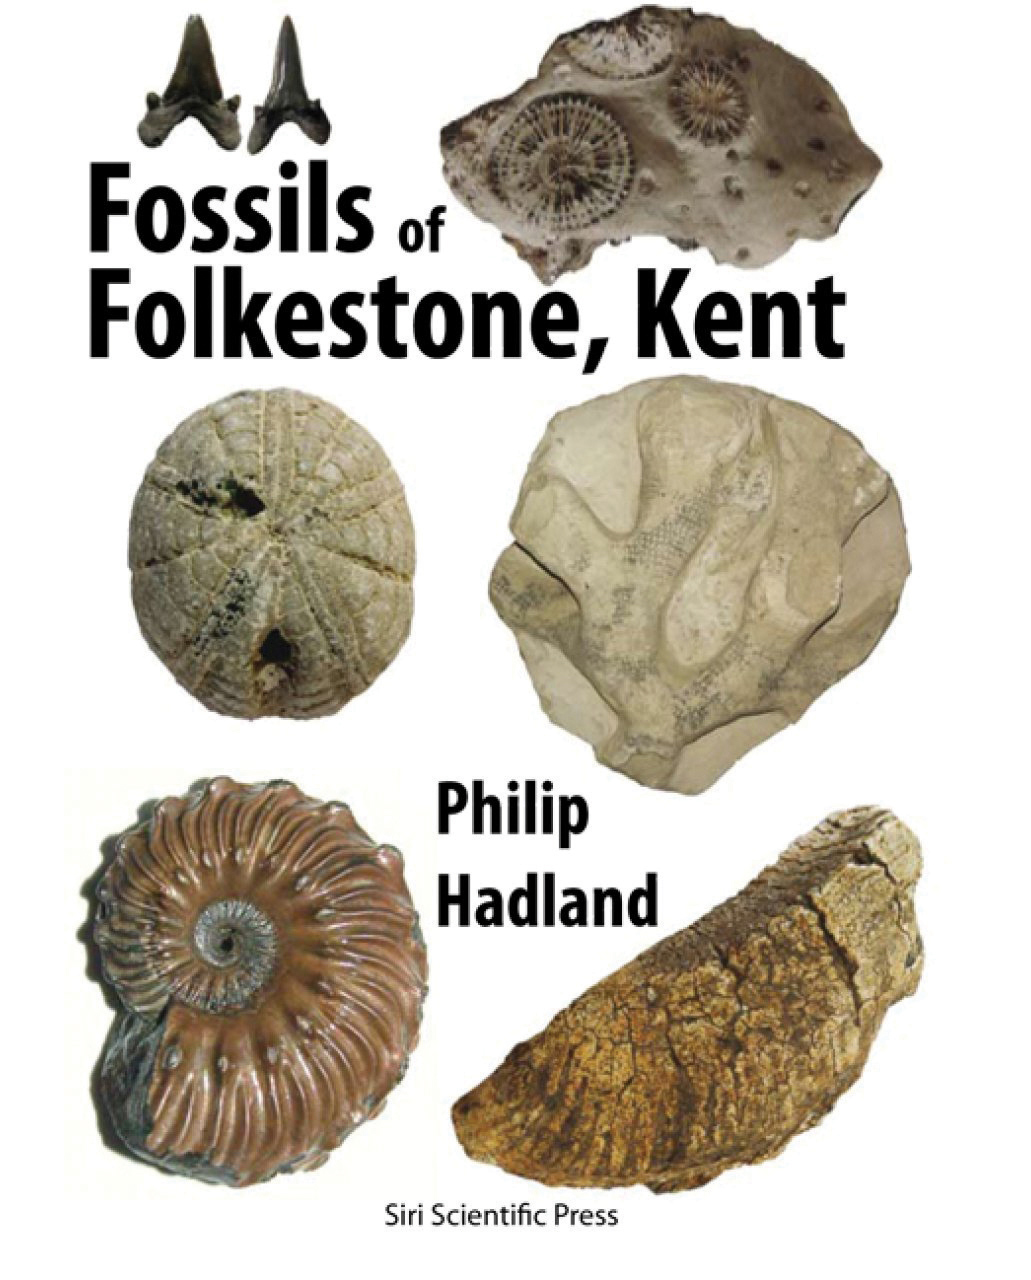 Fossils of Folkestone